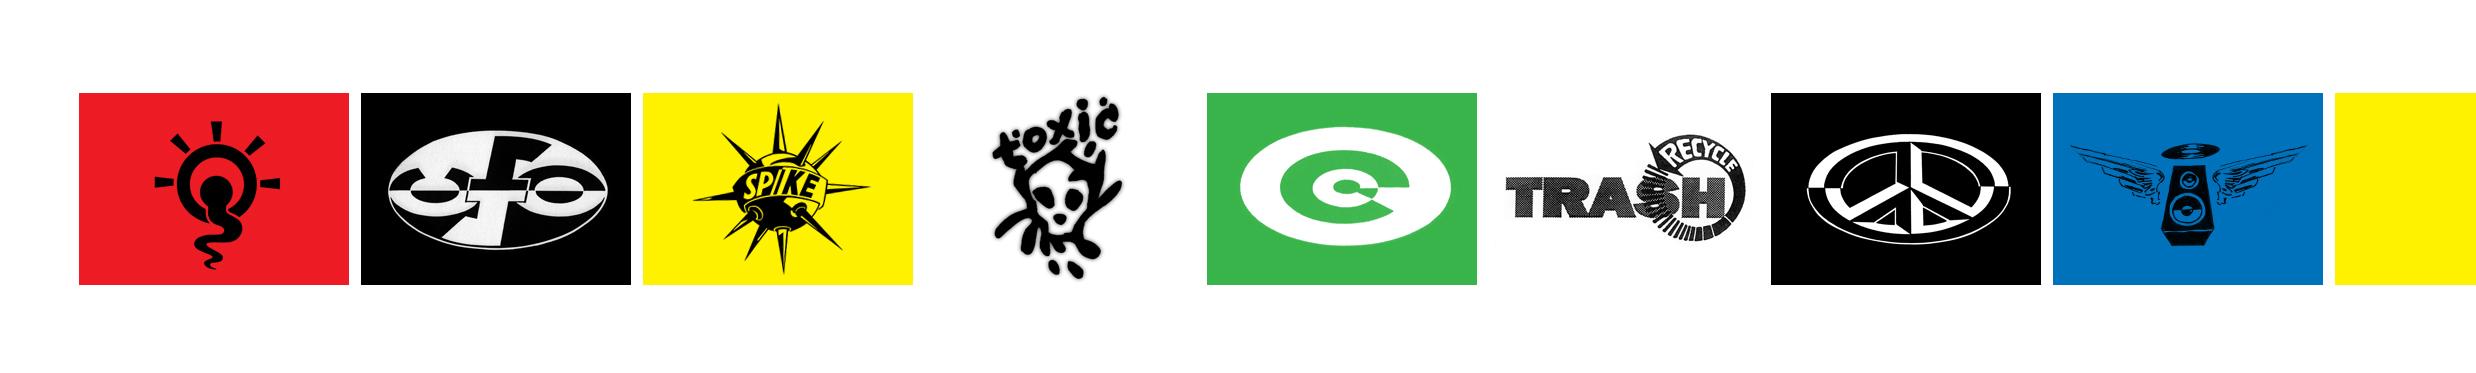 eden_ufo_logo.jpg